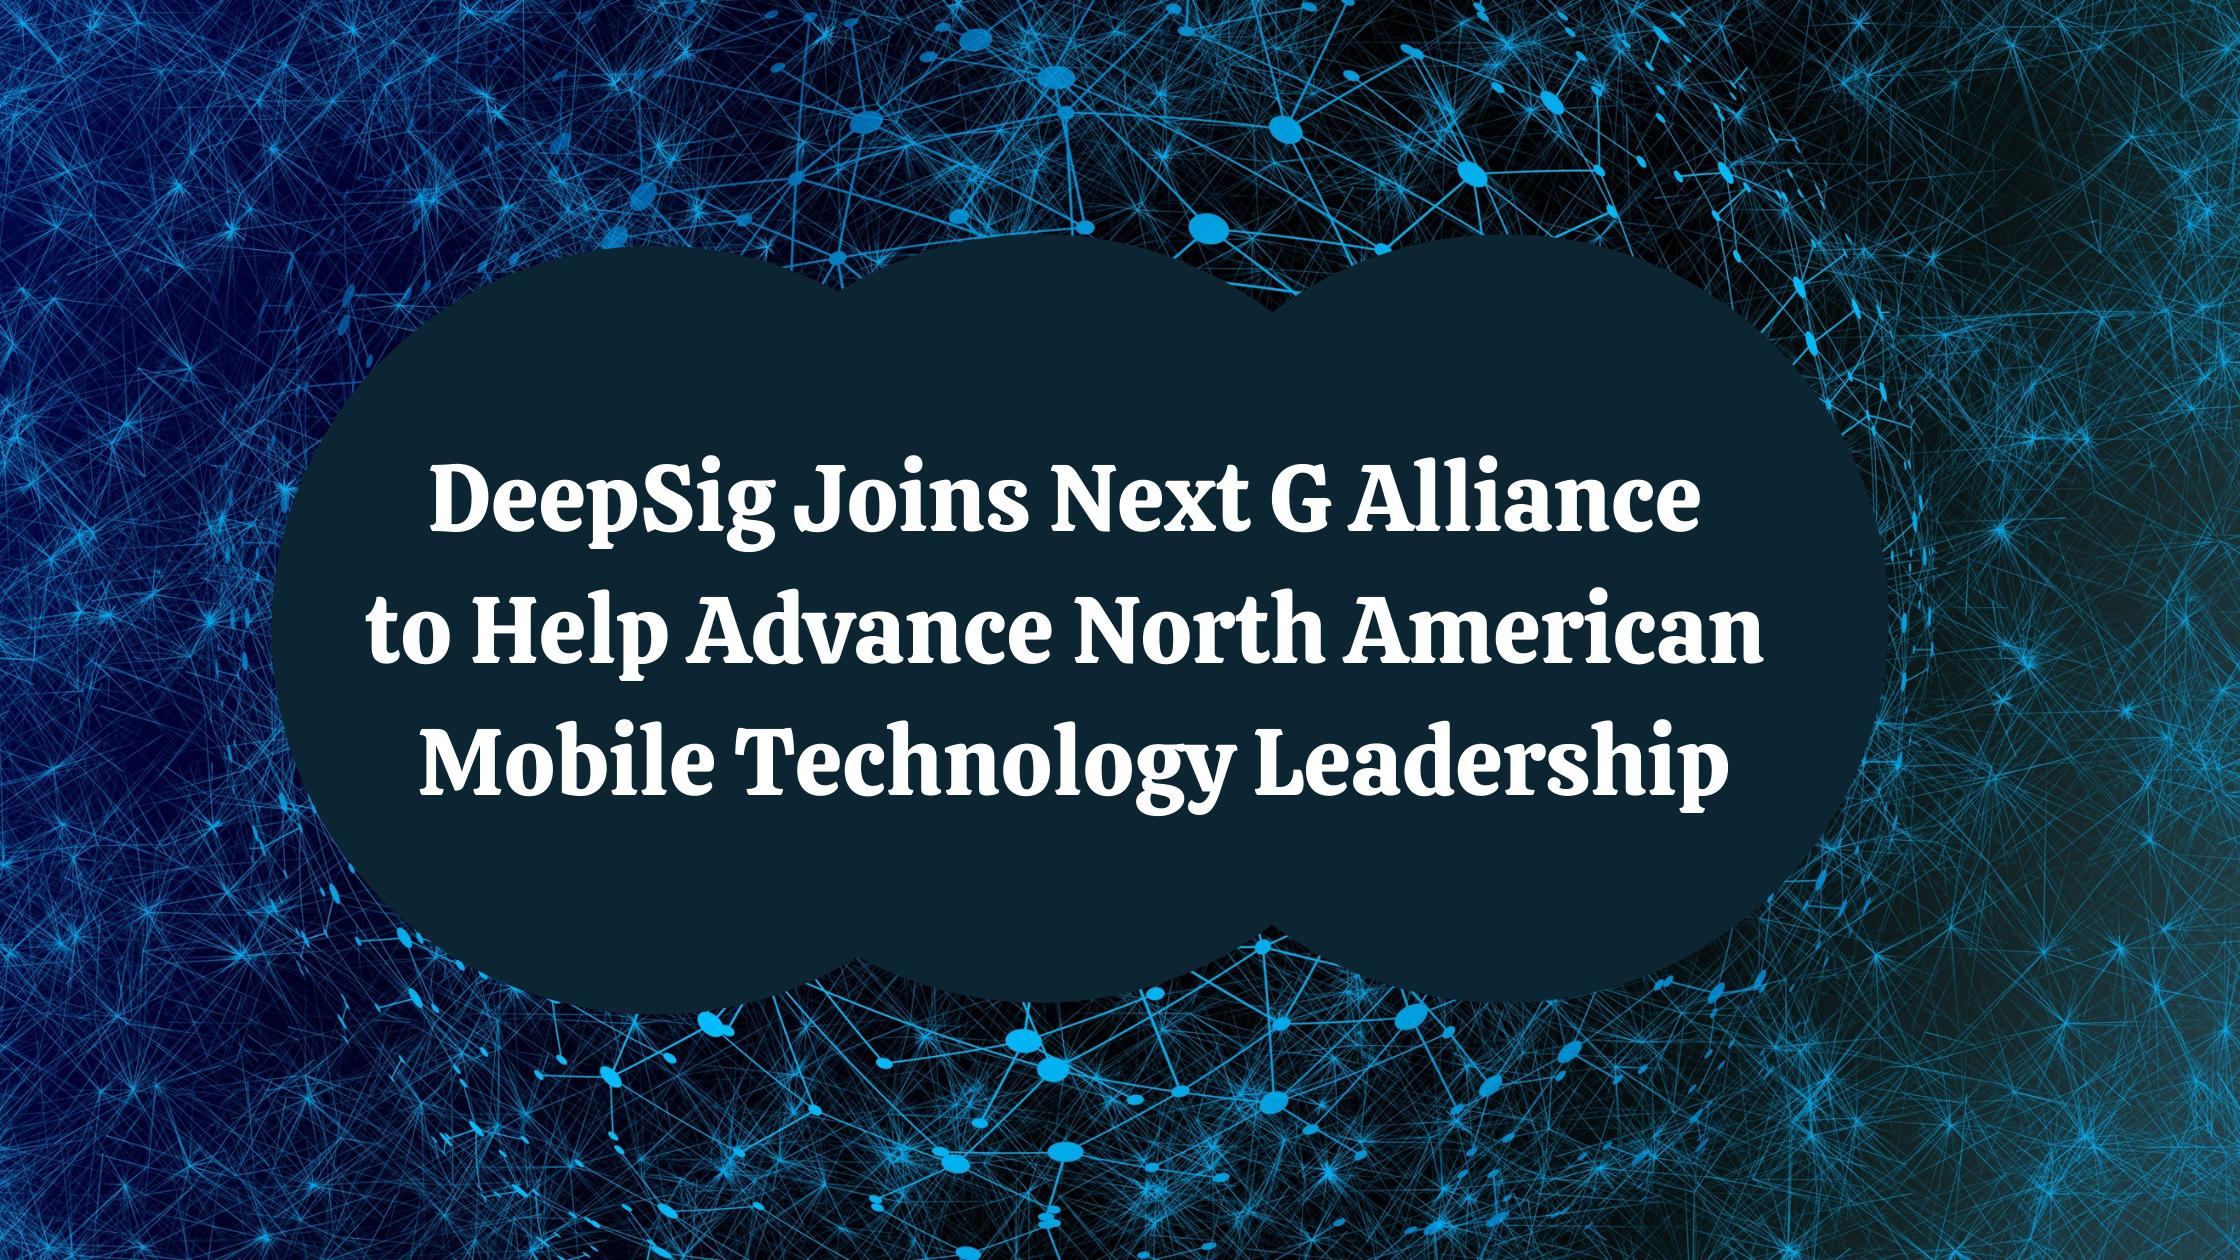 DeepSig Joins Next G Alliance